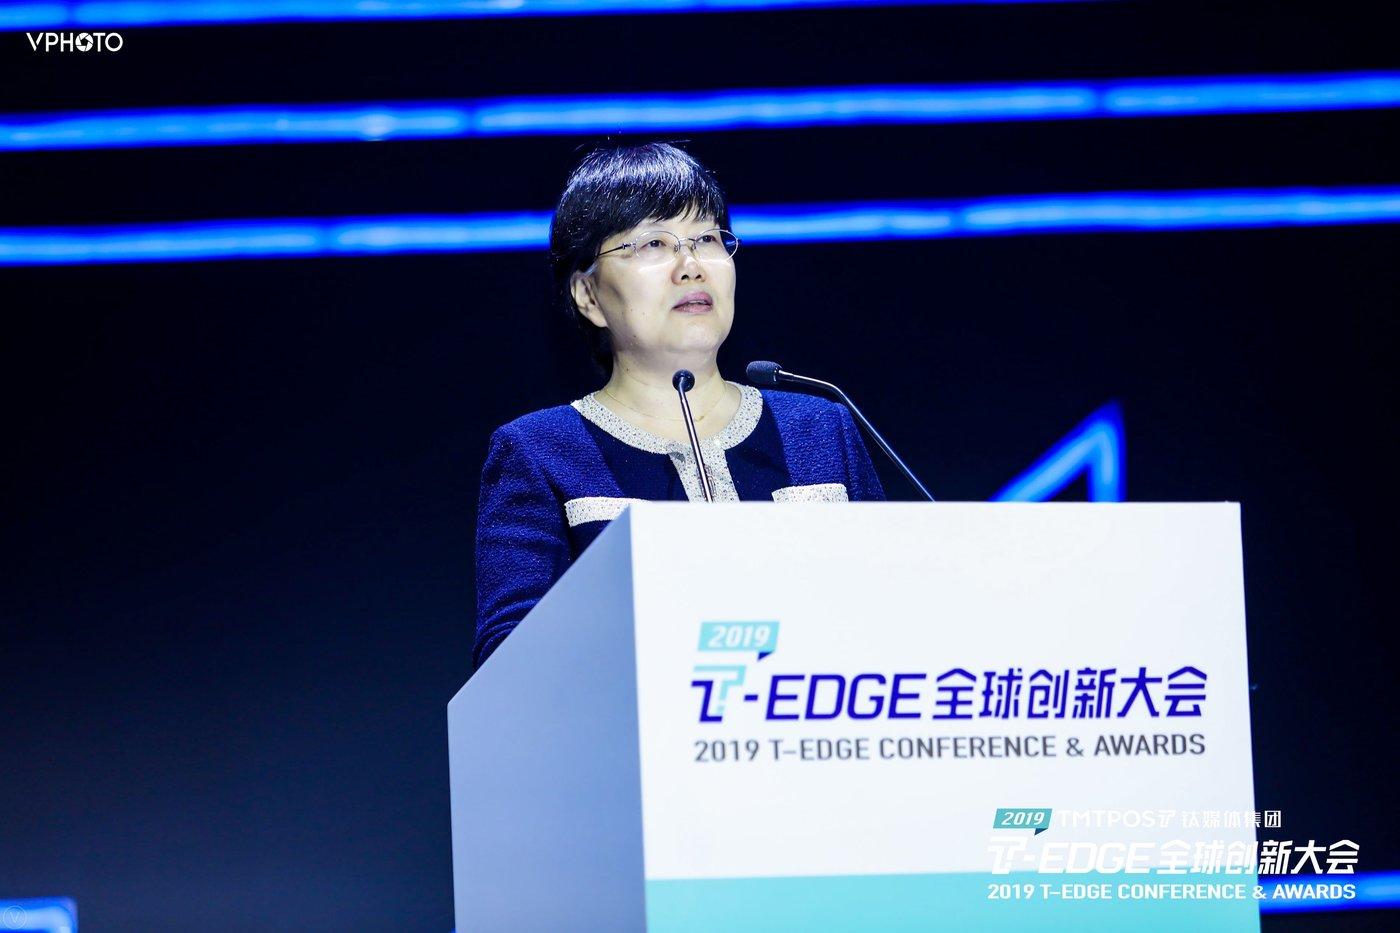 Yang Xiuling, deputy secretariat of Beijing Municipal Government, makes remarks at T-EDGE 2019